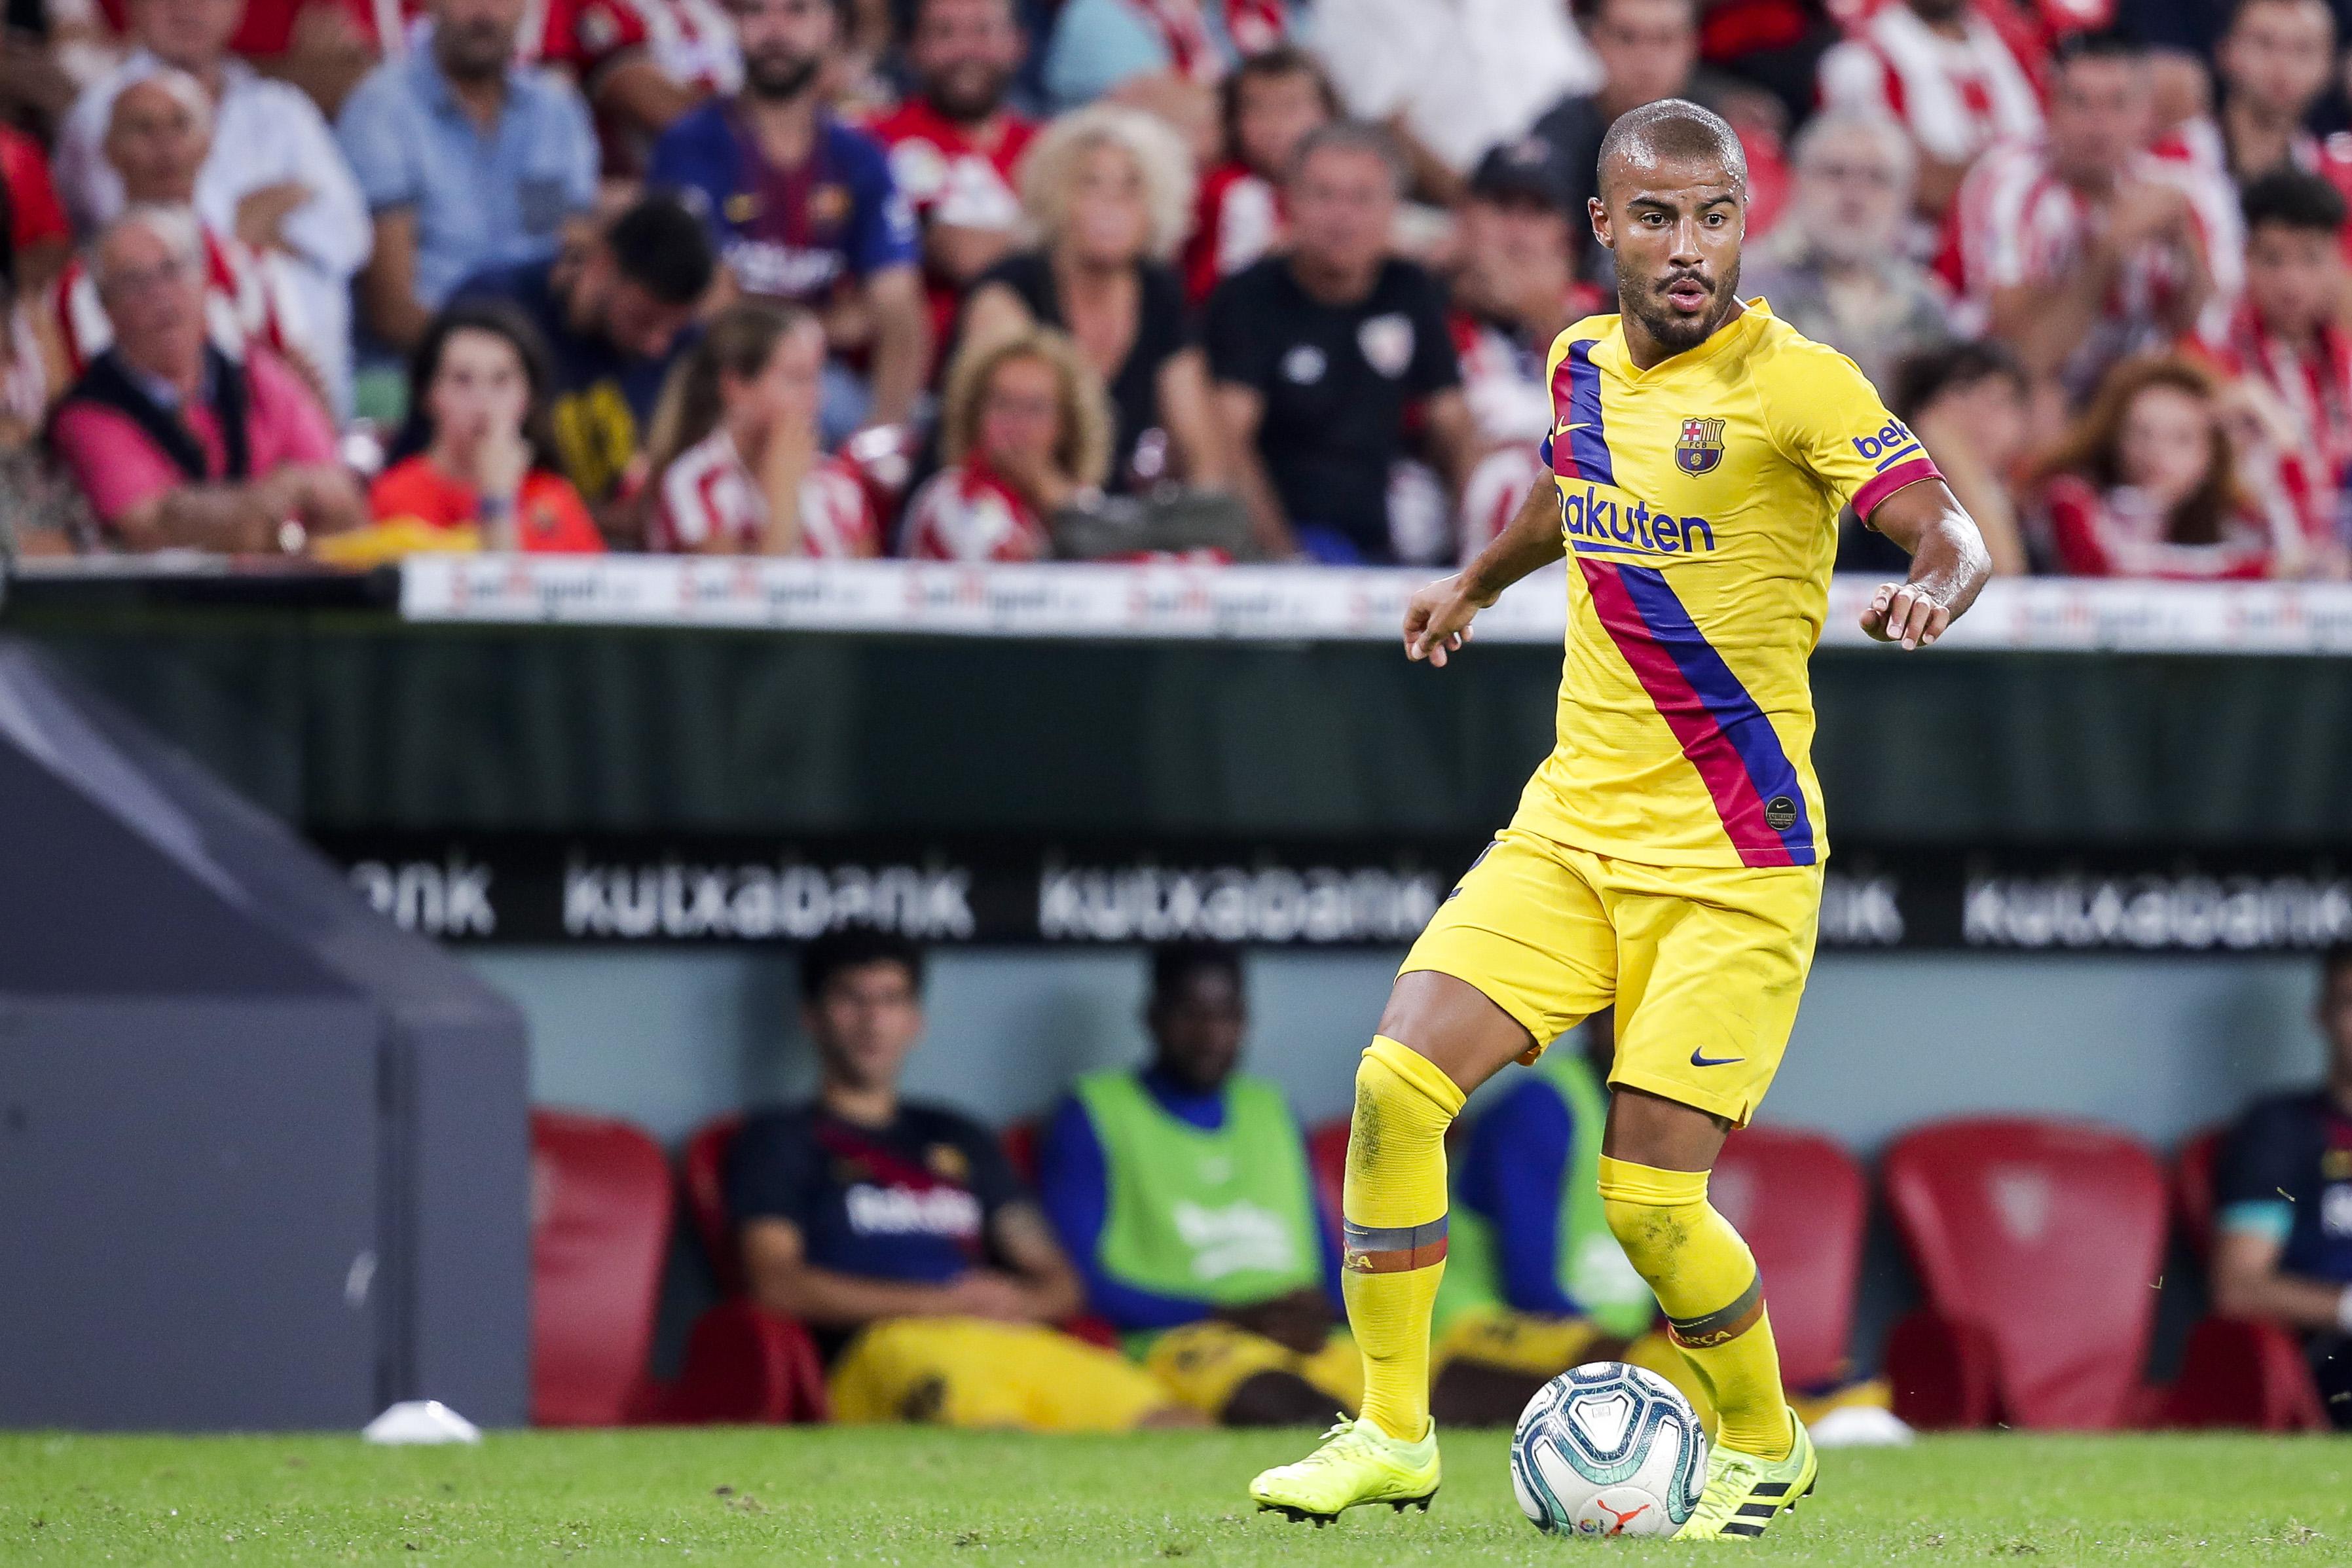 Athletic de Bilbao v FC Barcelona - La Liga Santander